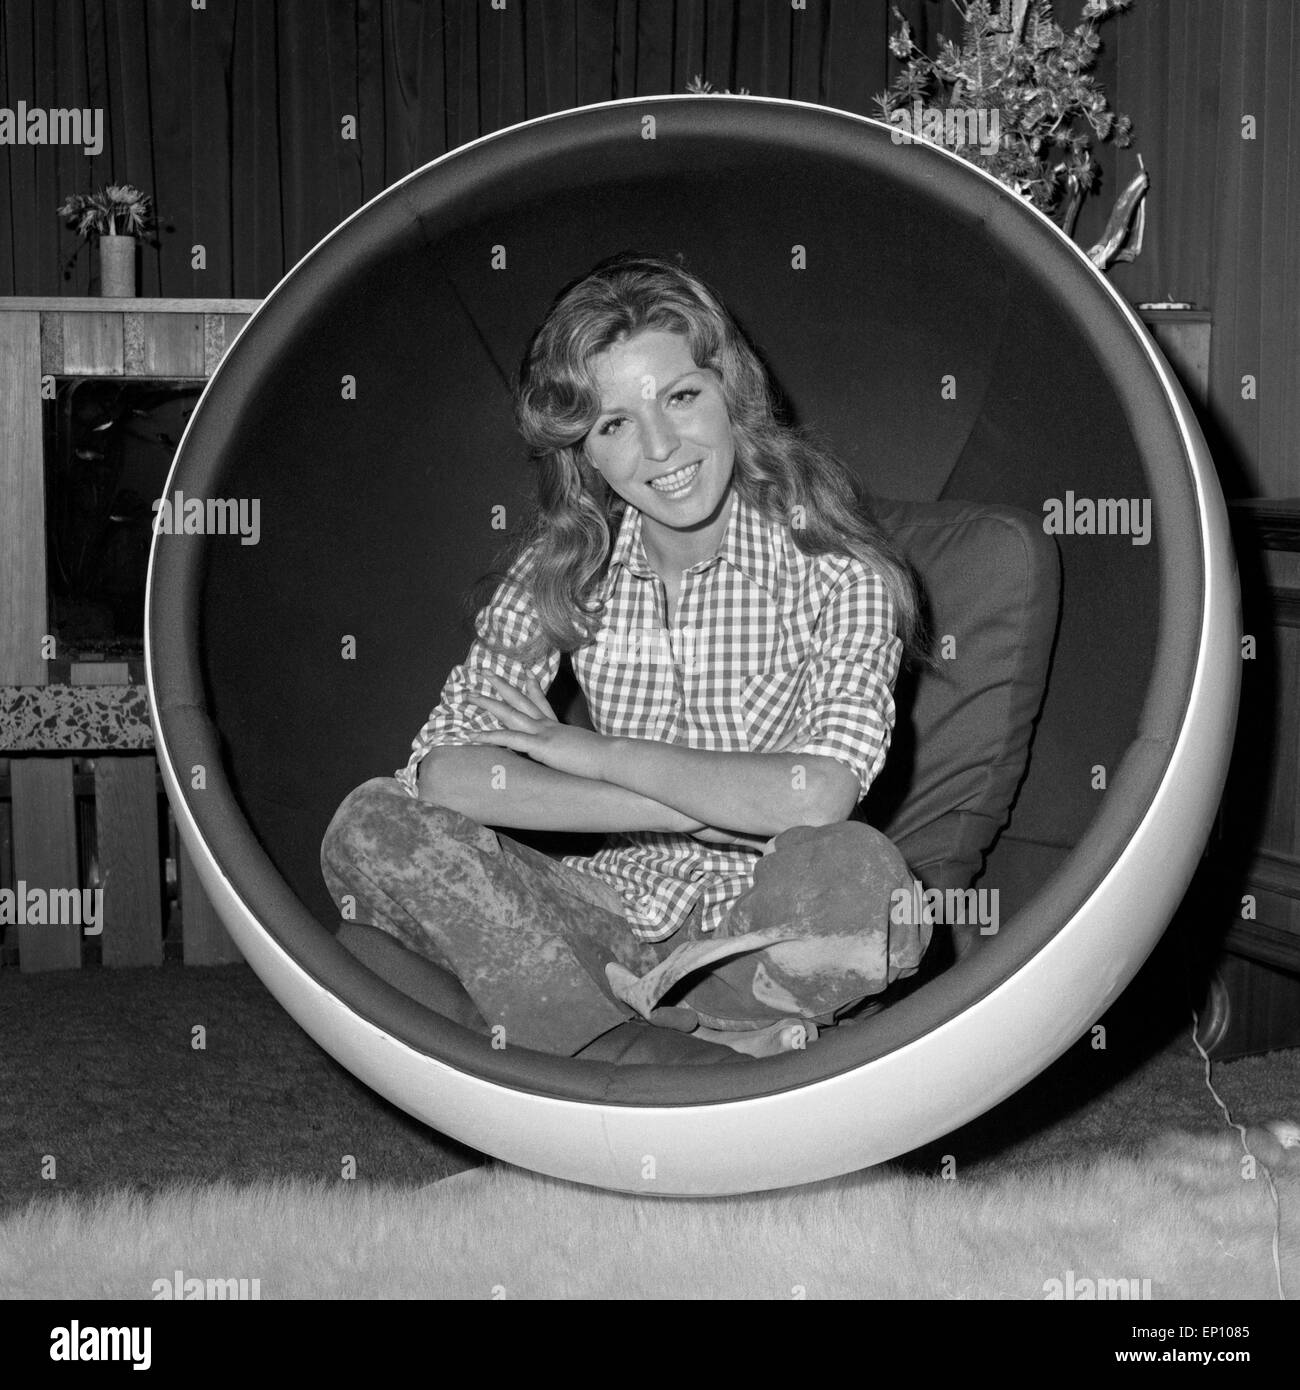 die deutsche schlagers ngerin manuela in einem kugelsessel in ihrem stock photo royalty free. Black Bedroom Furniture Sets. Home Design Ideas